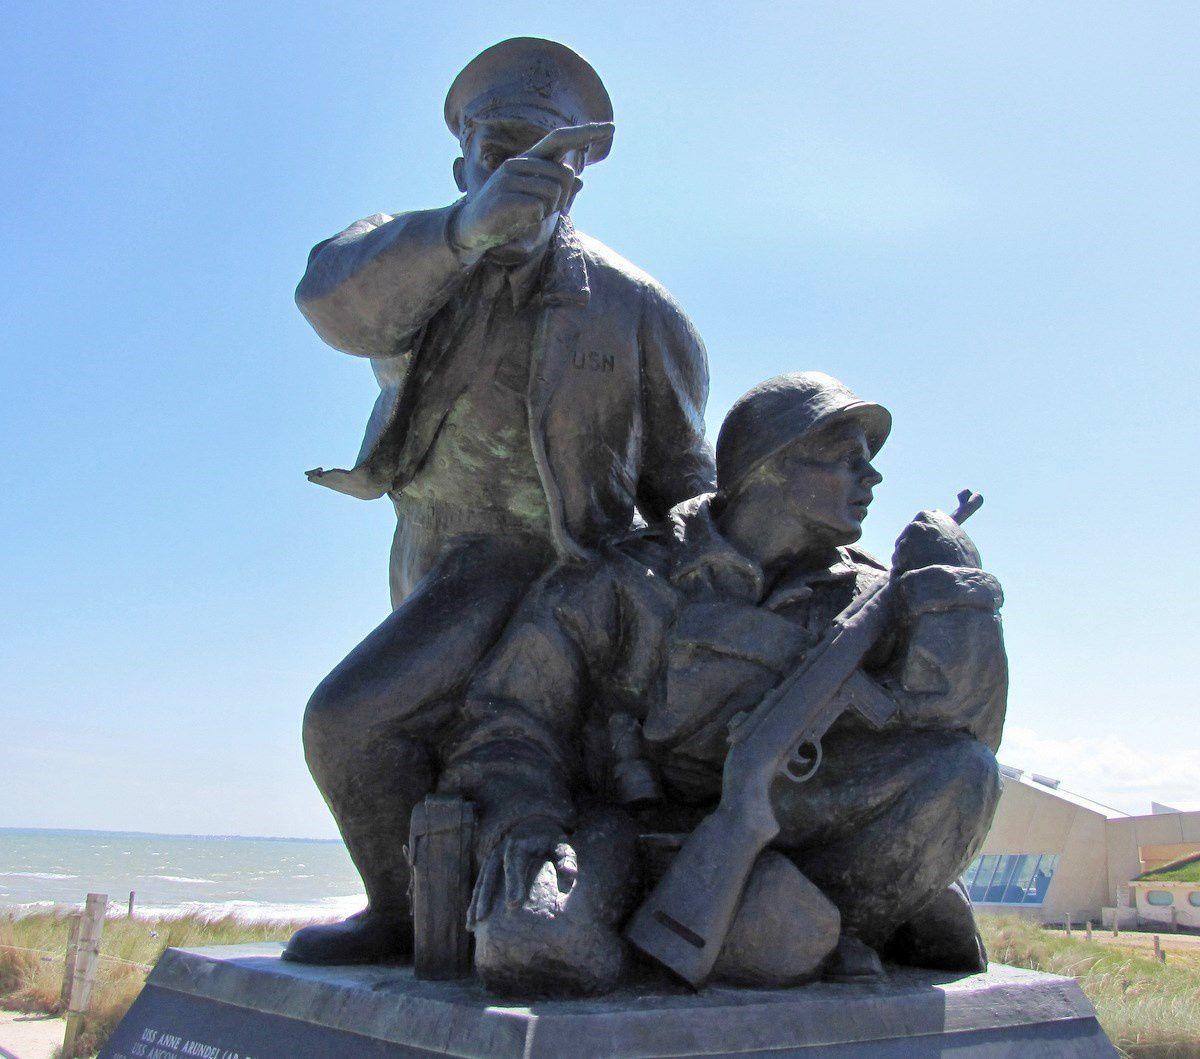 Monument de l'US Navy Normandy, Utah Beach